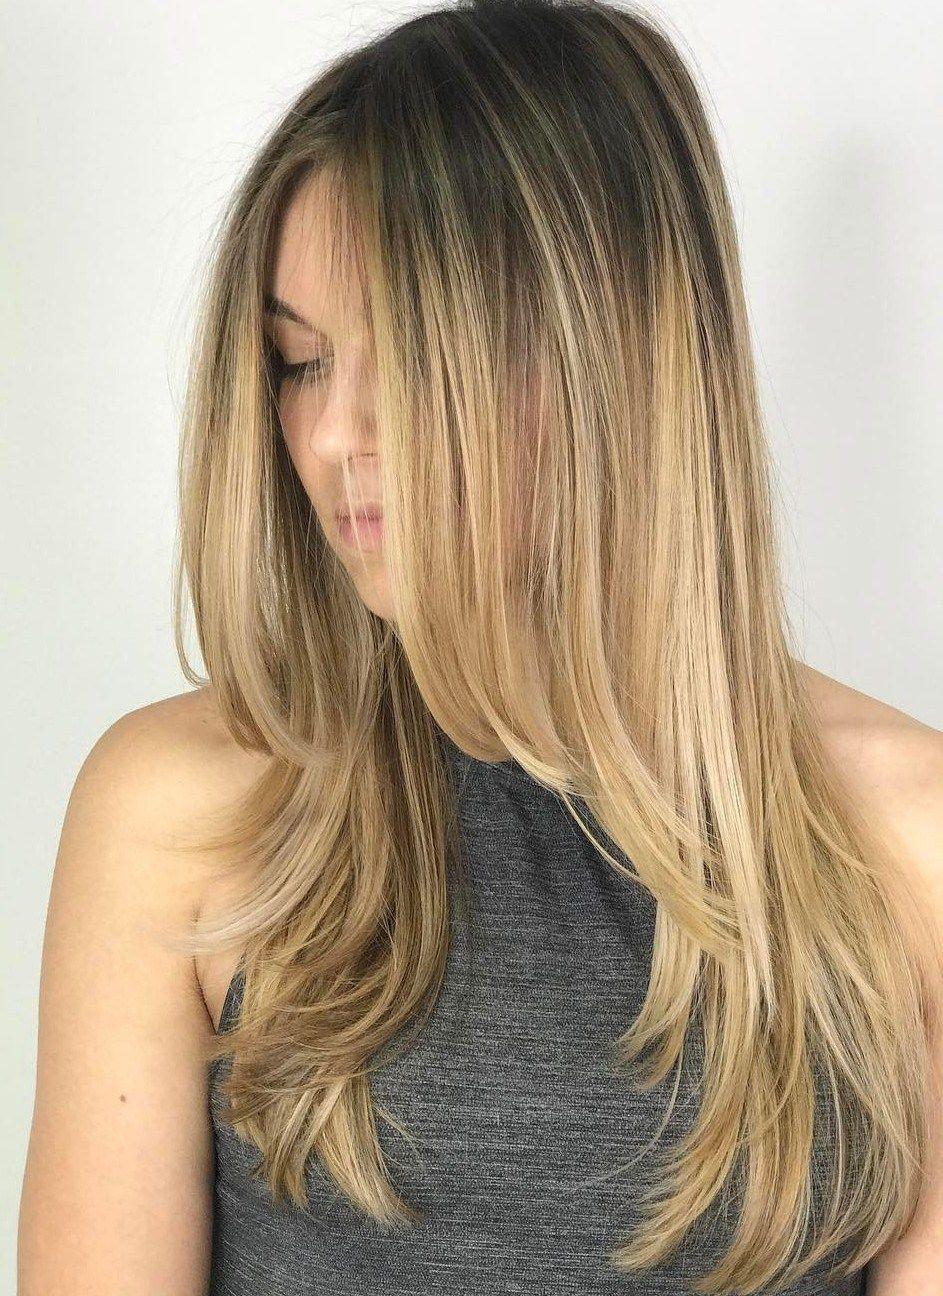 Pin On Hair Ideas In 2020 Thin Straight Hair Long Thin Hair Haircuts For Long Hair With Layers